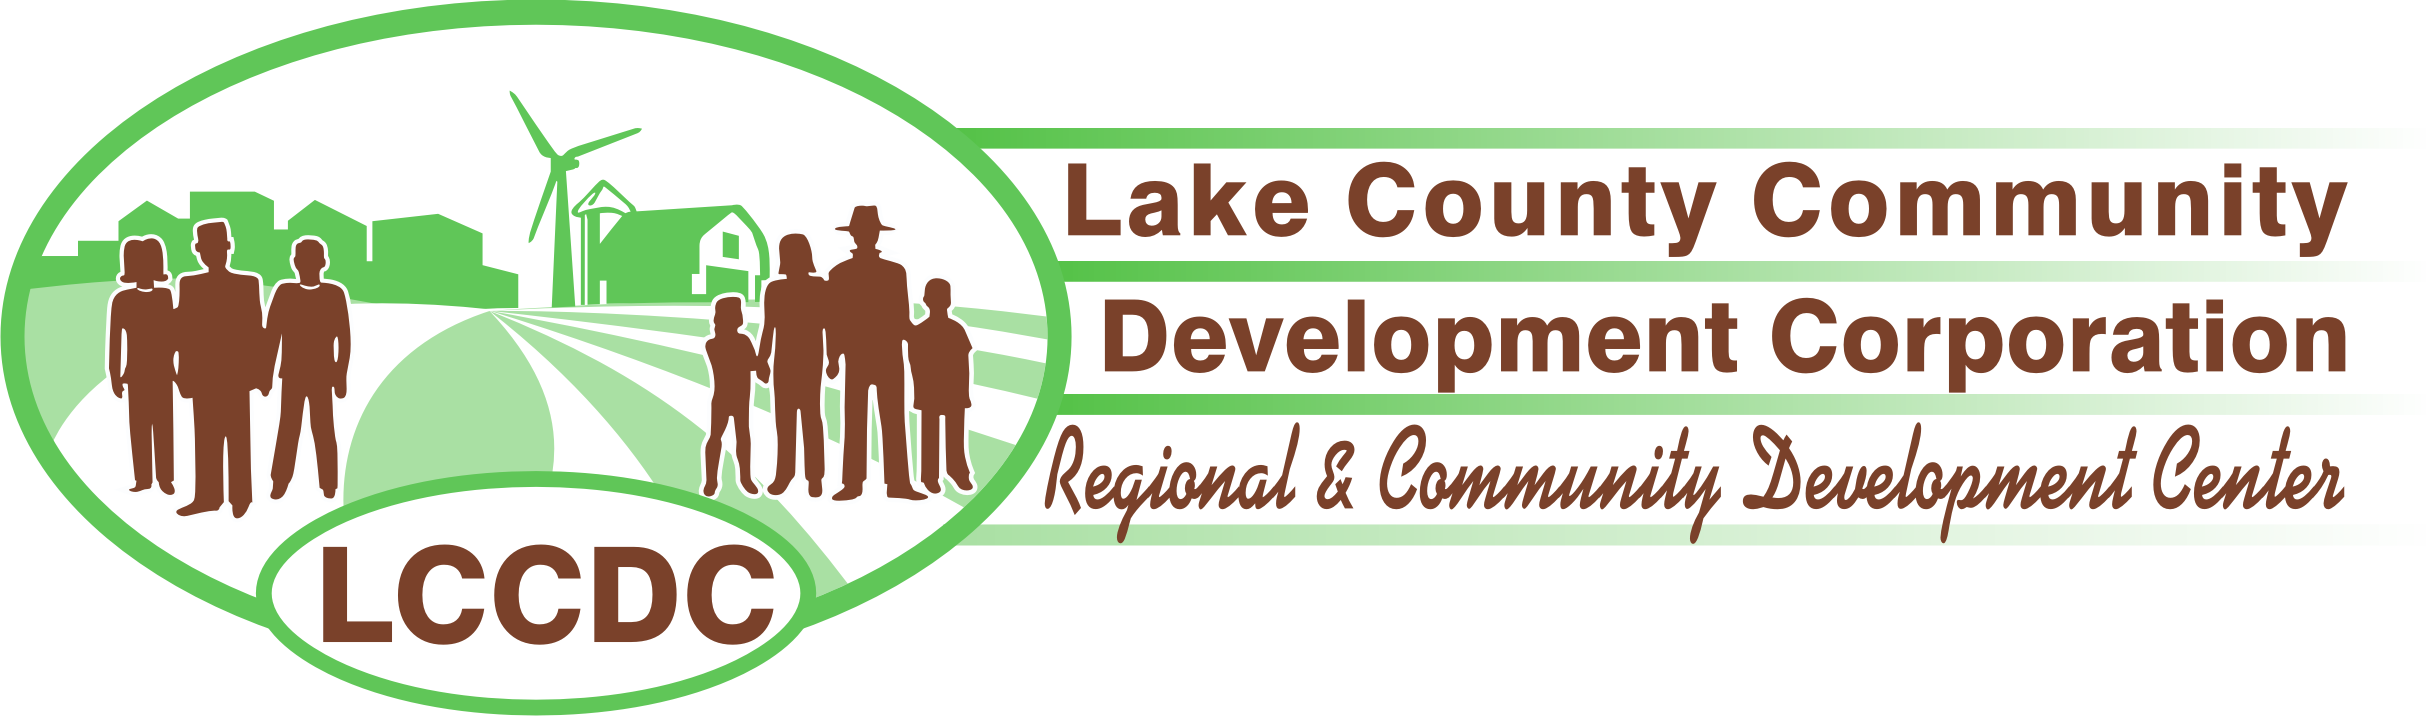 Community Development Center.